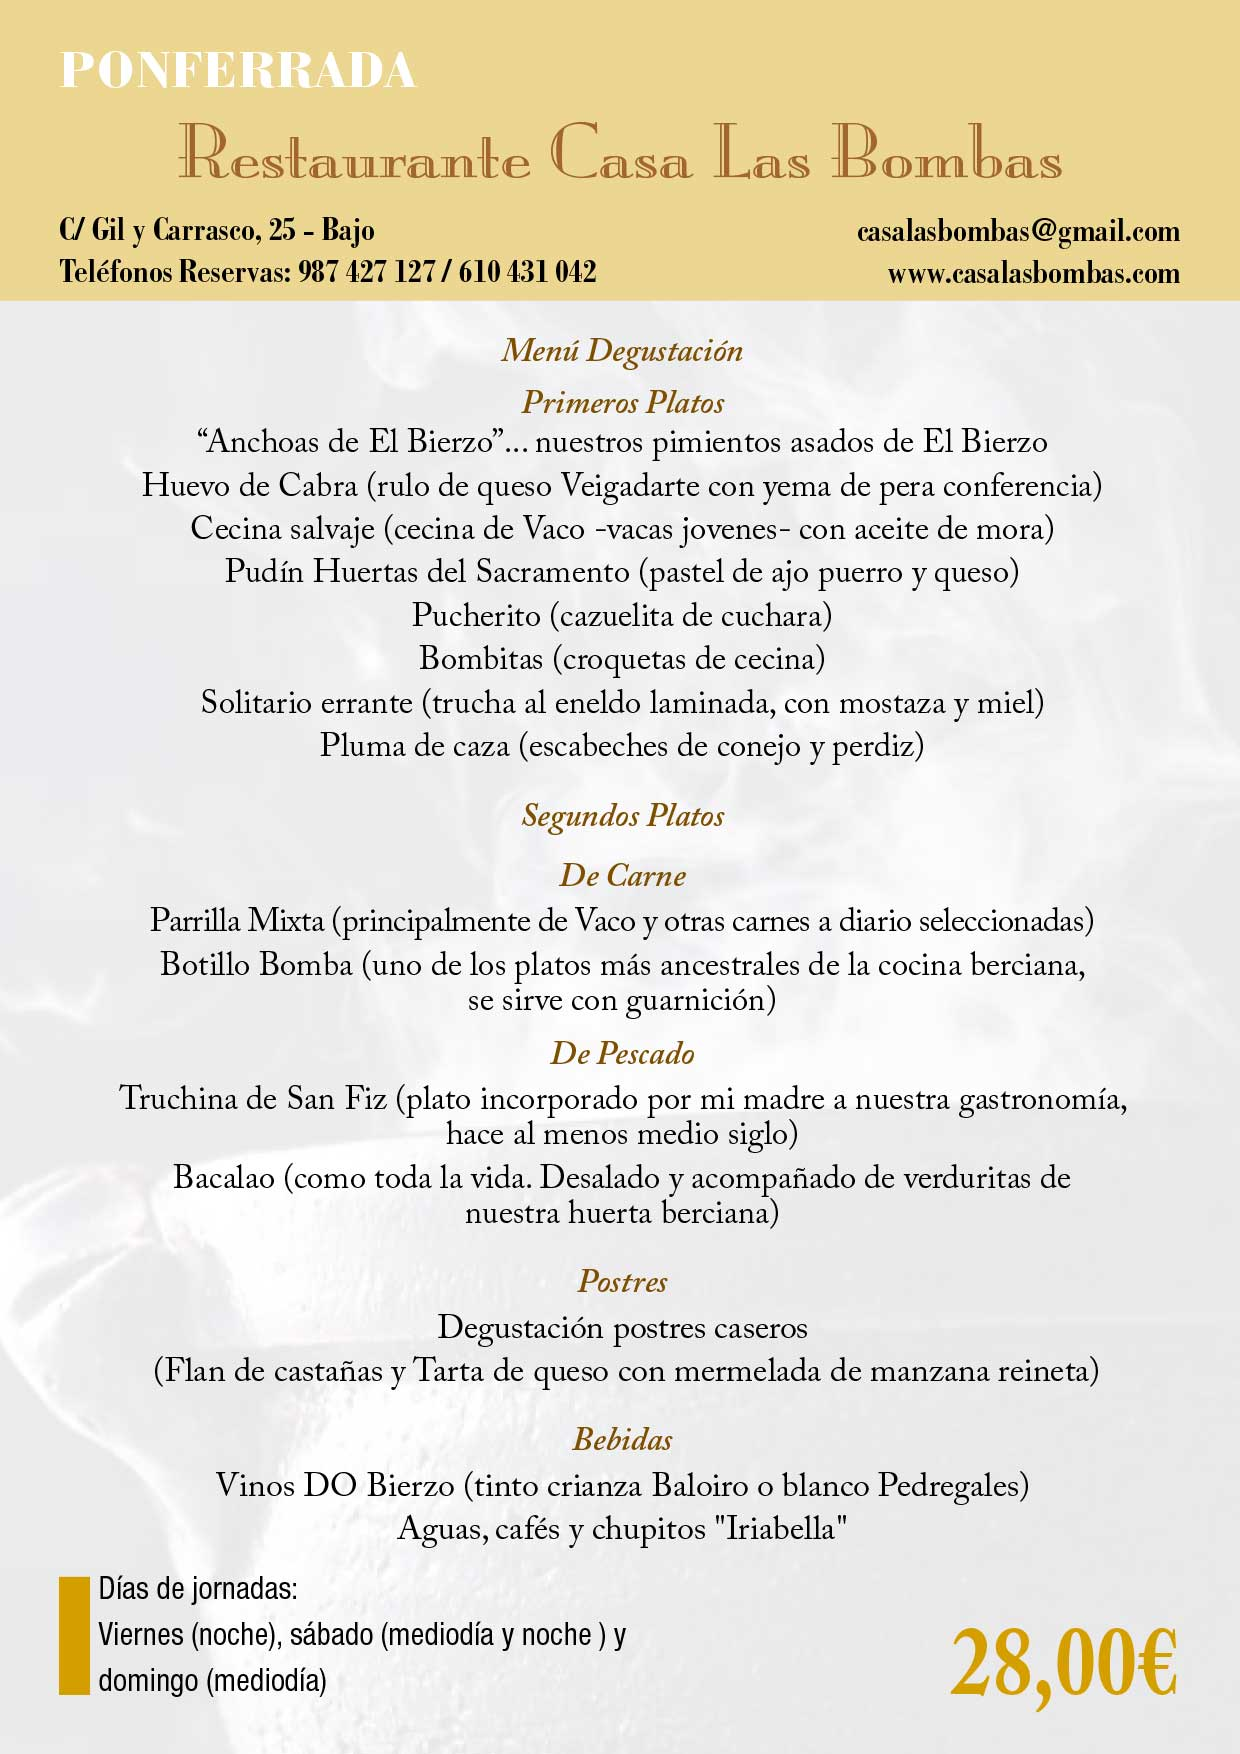 XXXIII Jornadas gastronómicas del Bierzo 2017. Restaurantes participantes 38